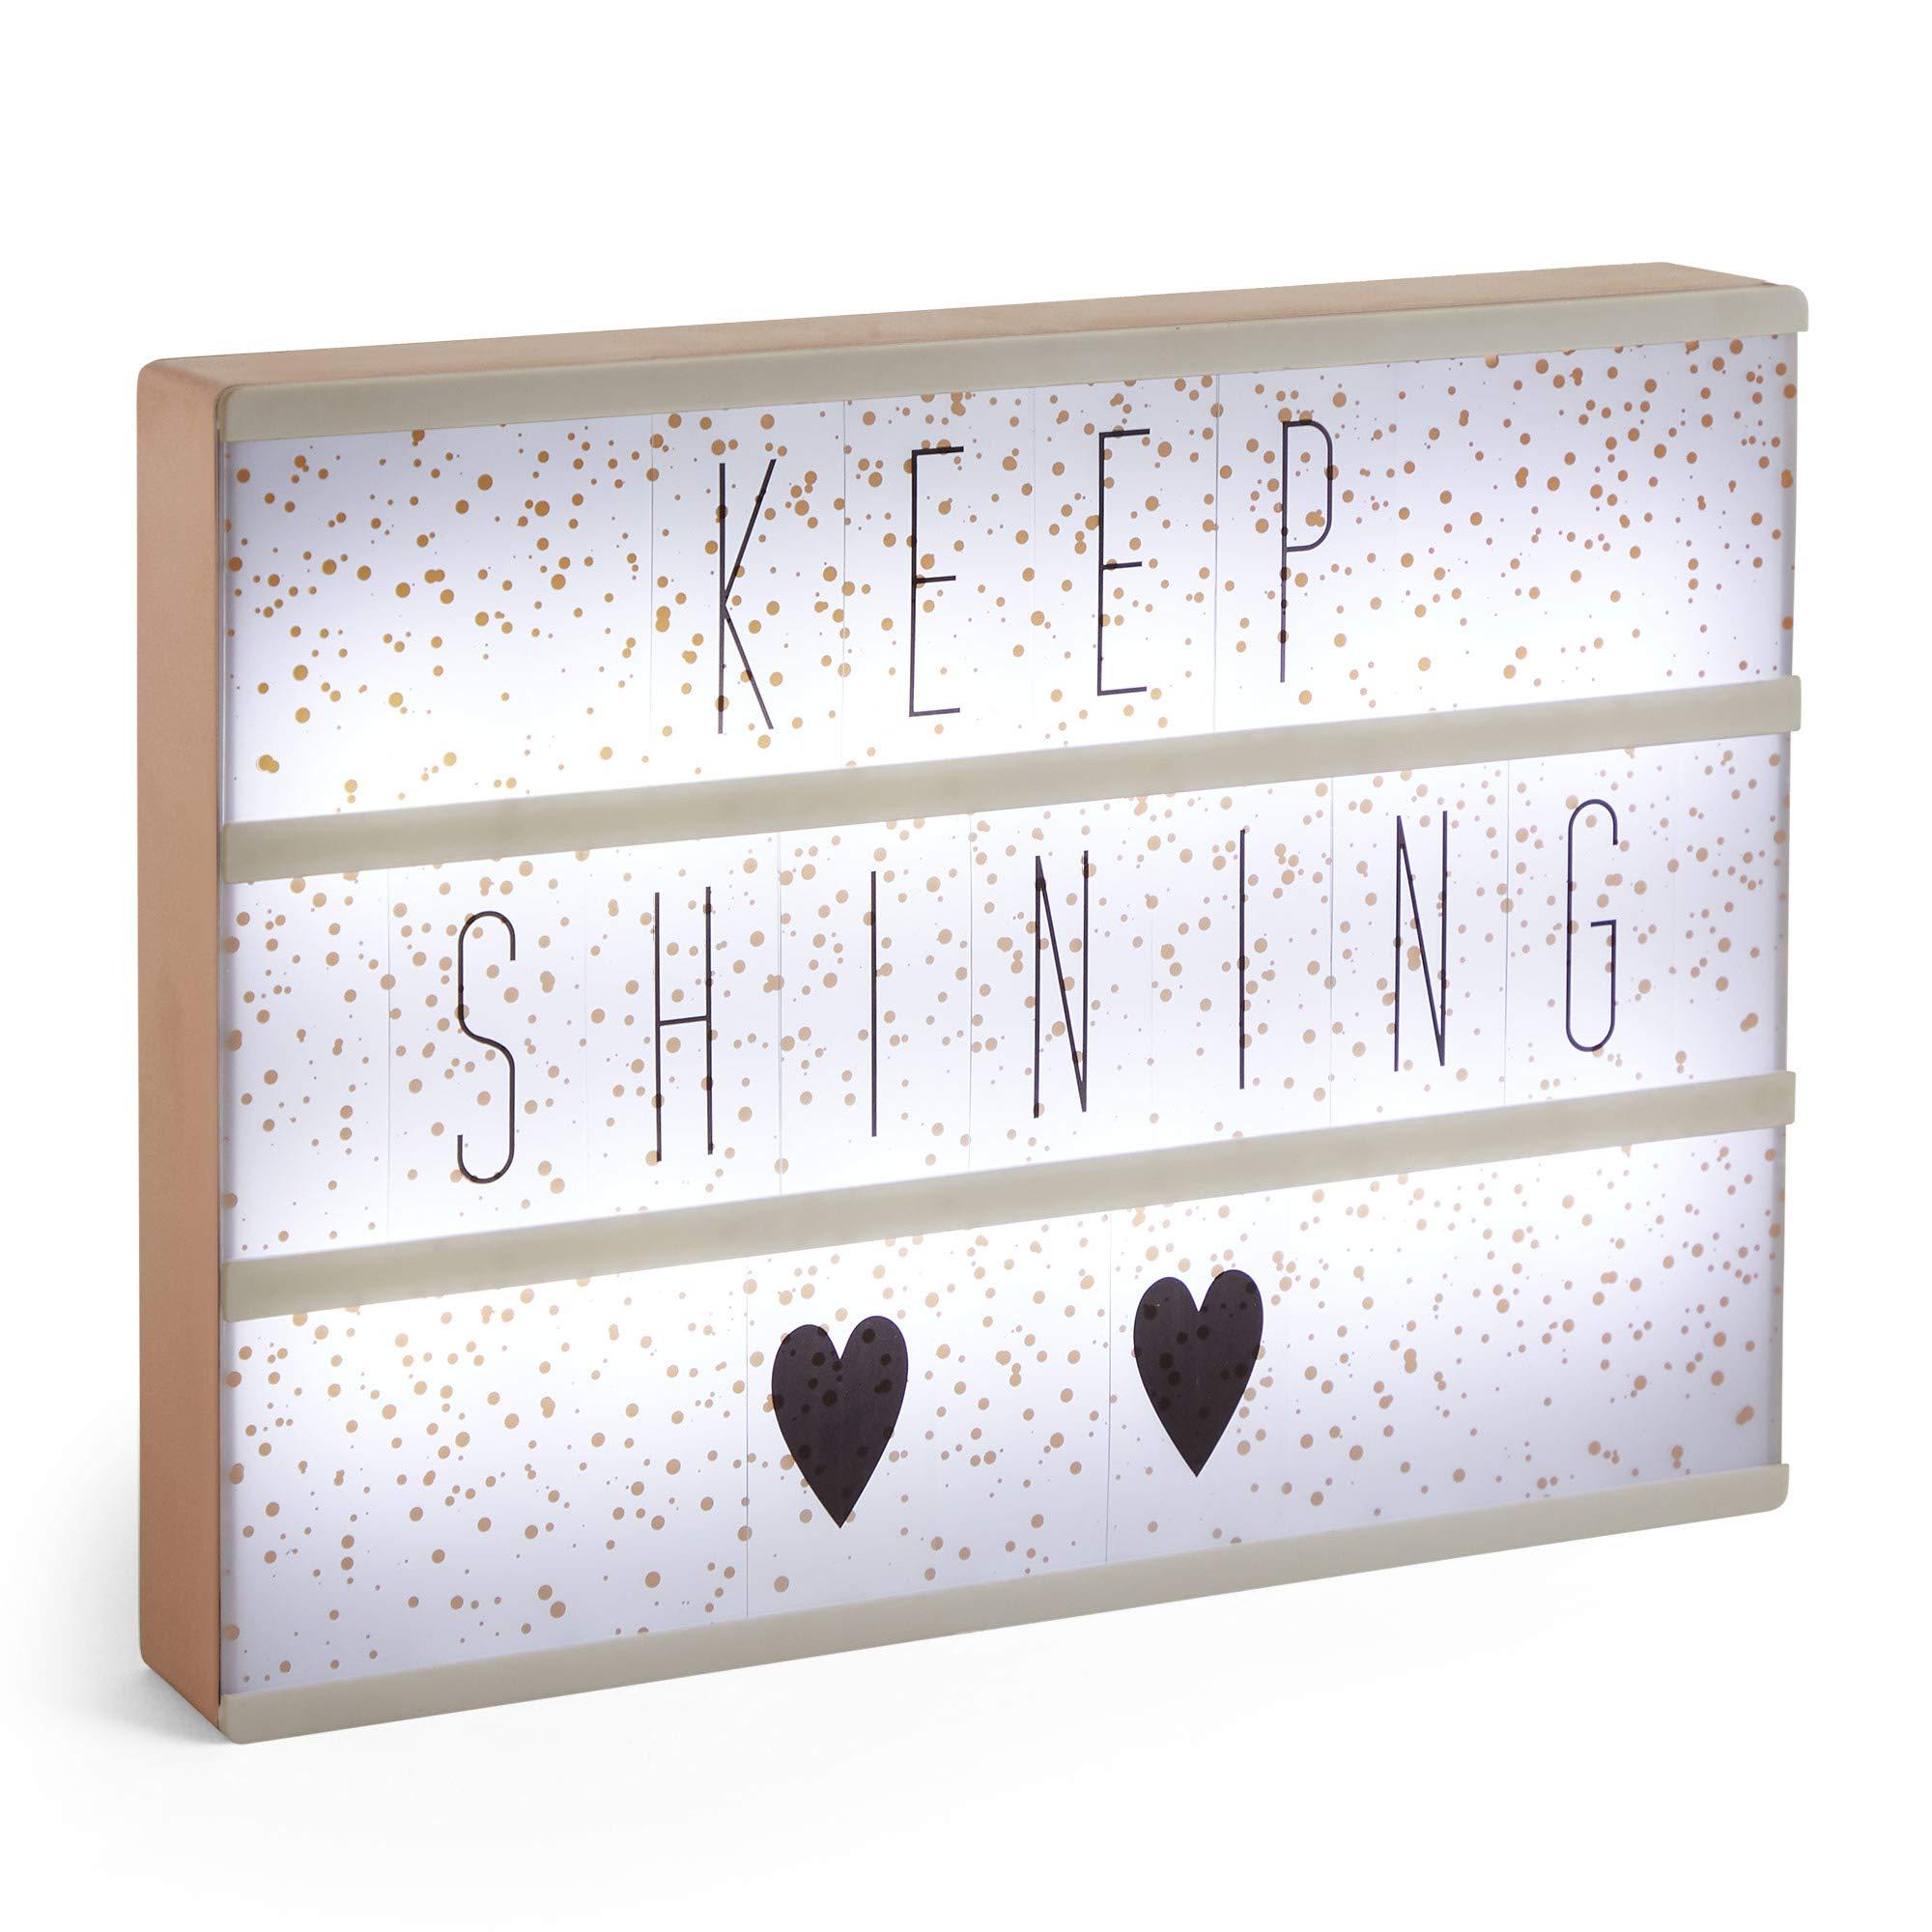 Beautify LED Lightbox – Customisable Light Up Letter Message Box Rose Gold - Christmas Gift - Gifts for Her - Secret Santa Gift